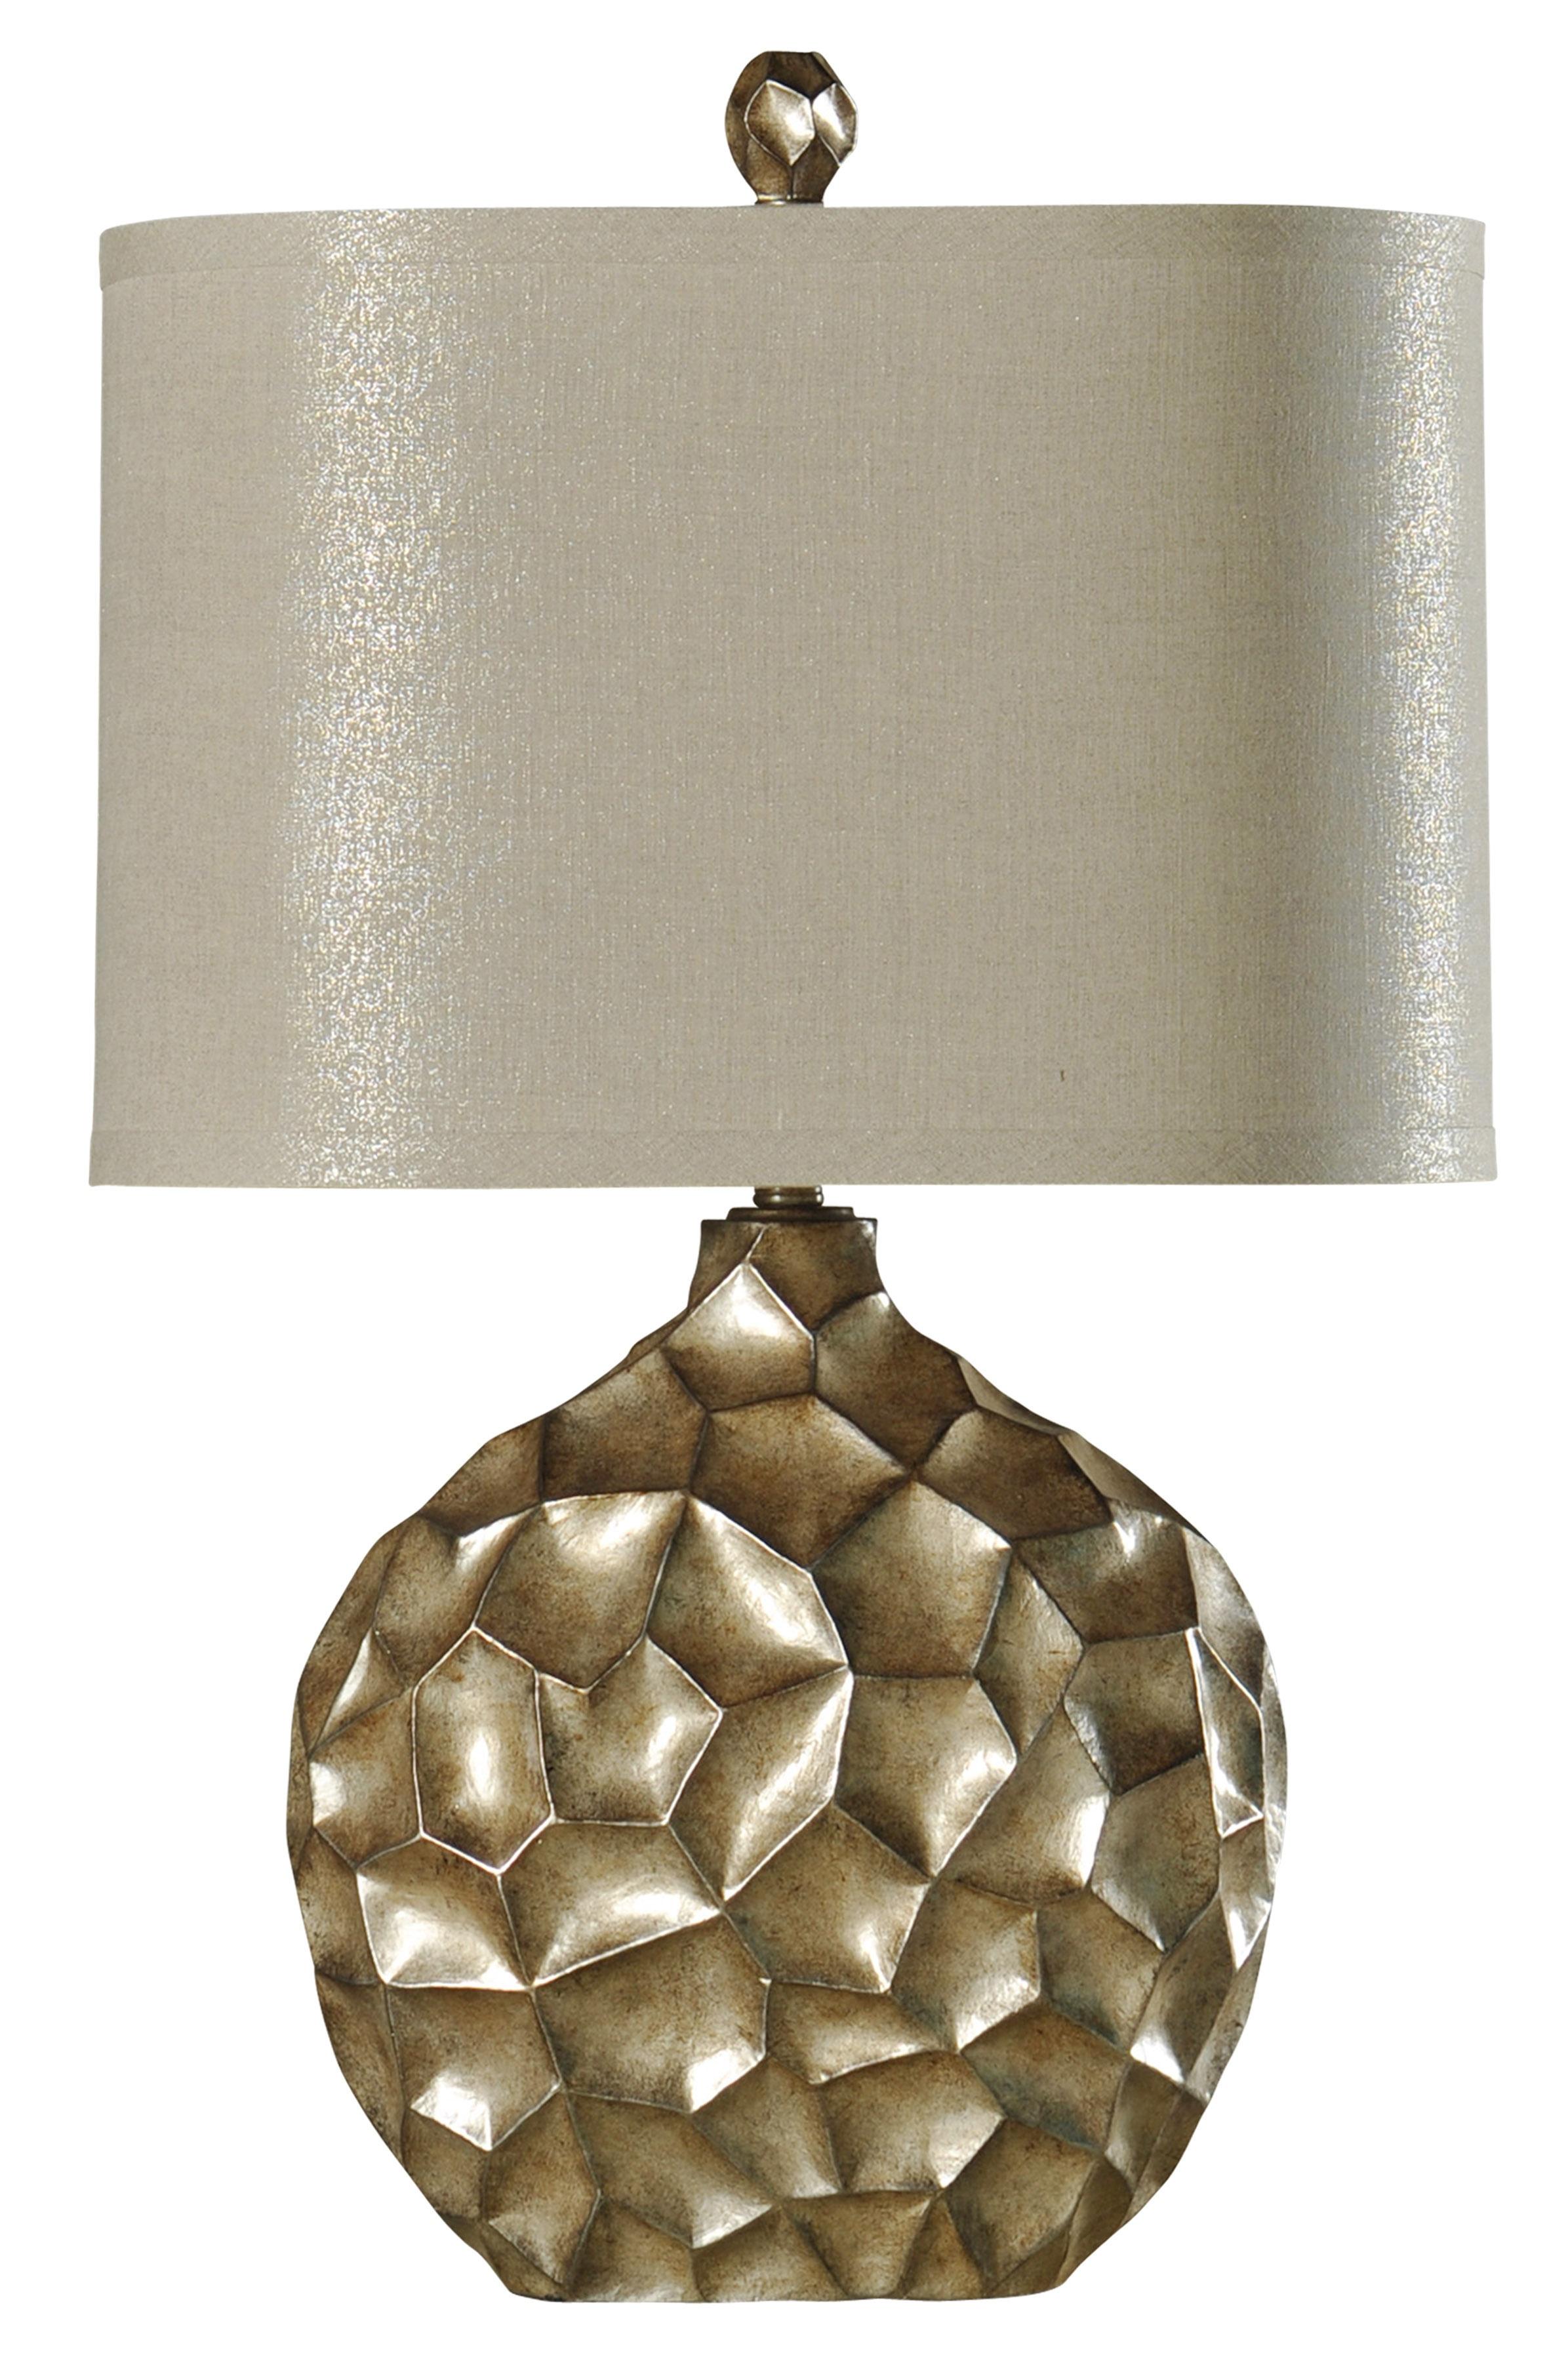 Janus Sculpted Silver Table Lamp